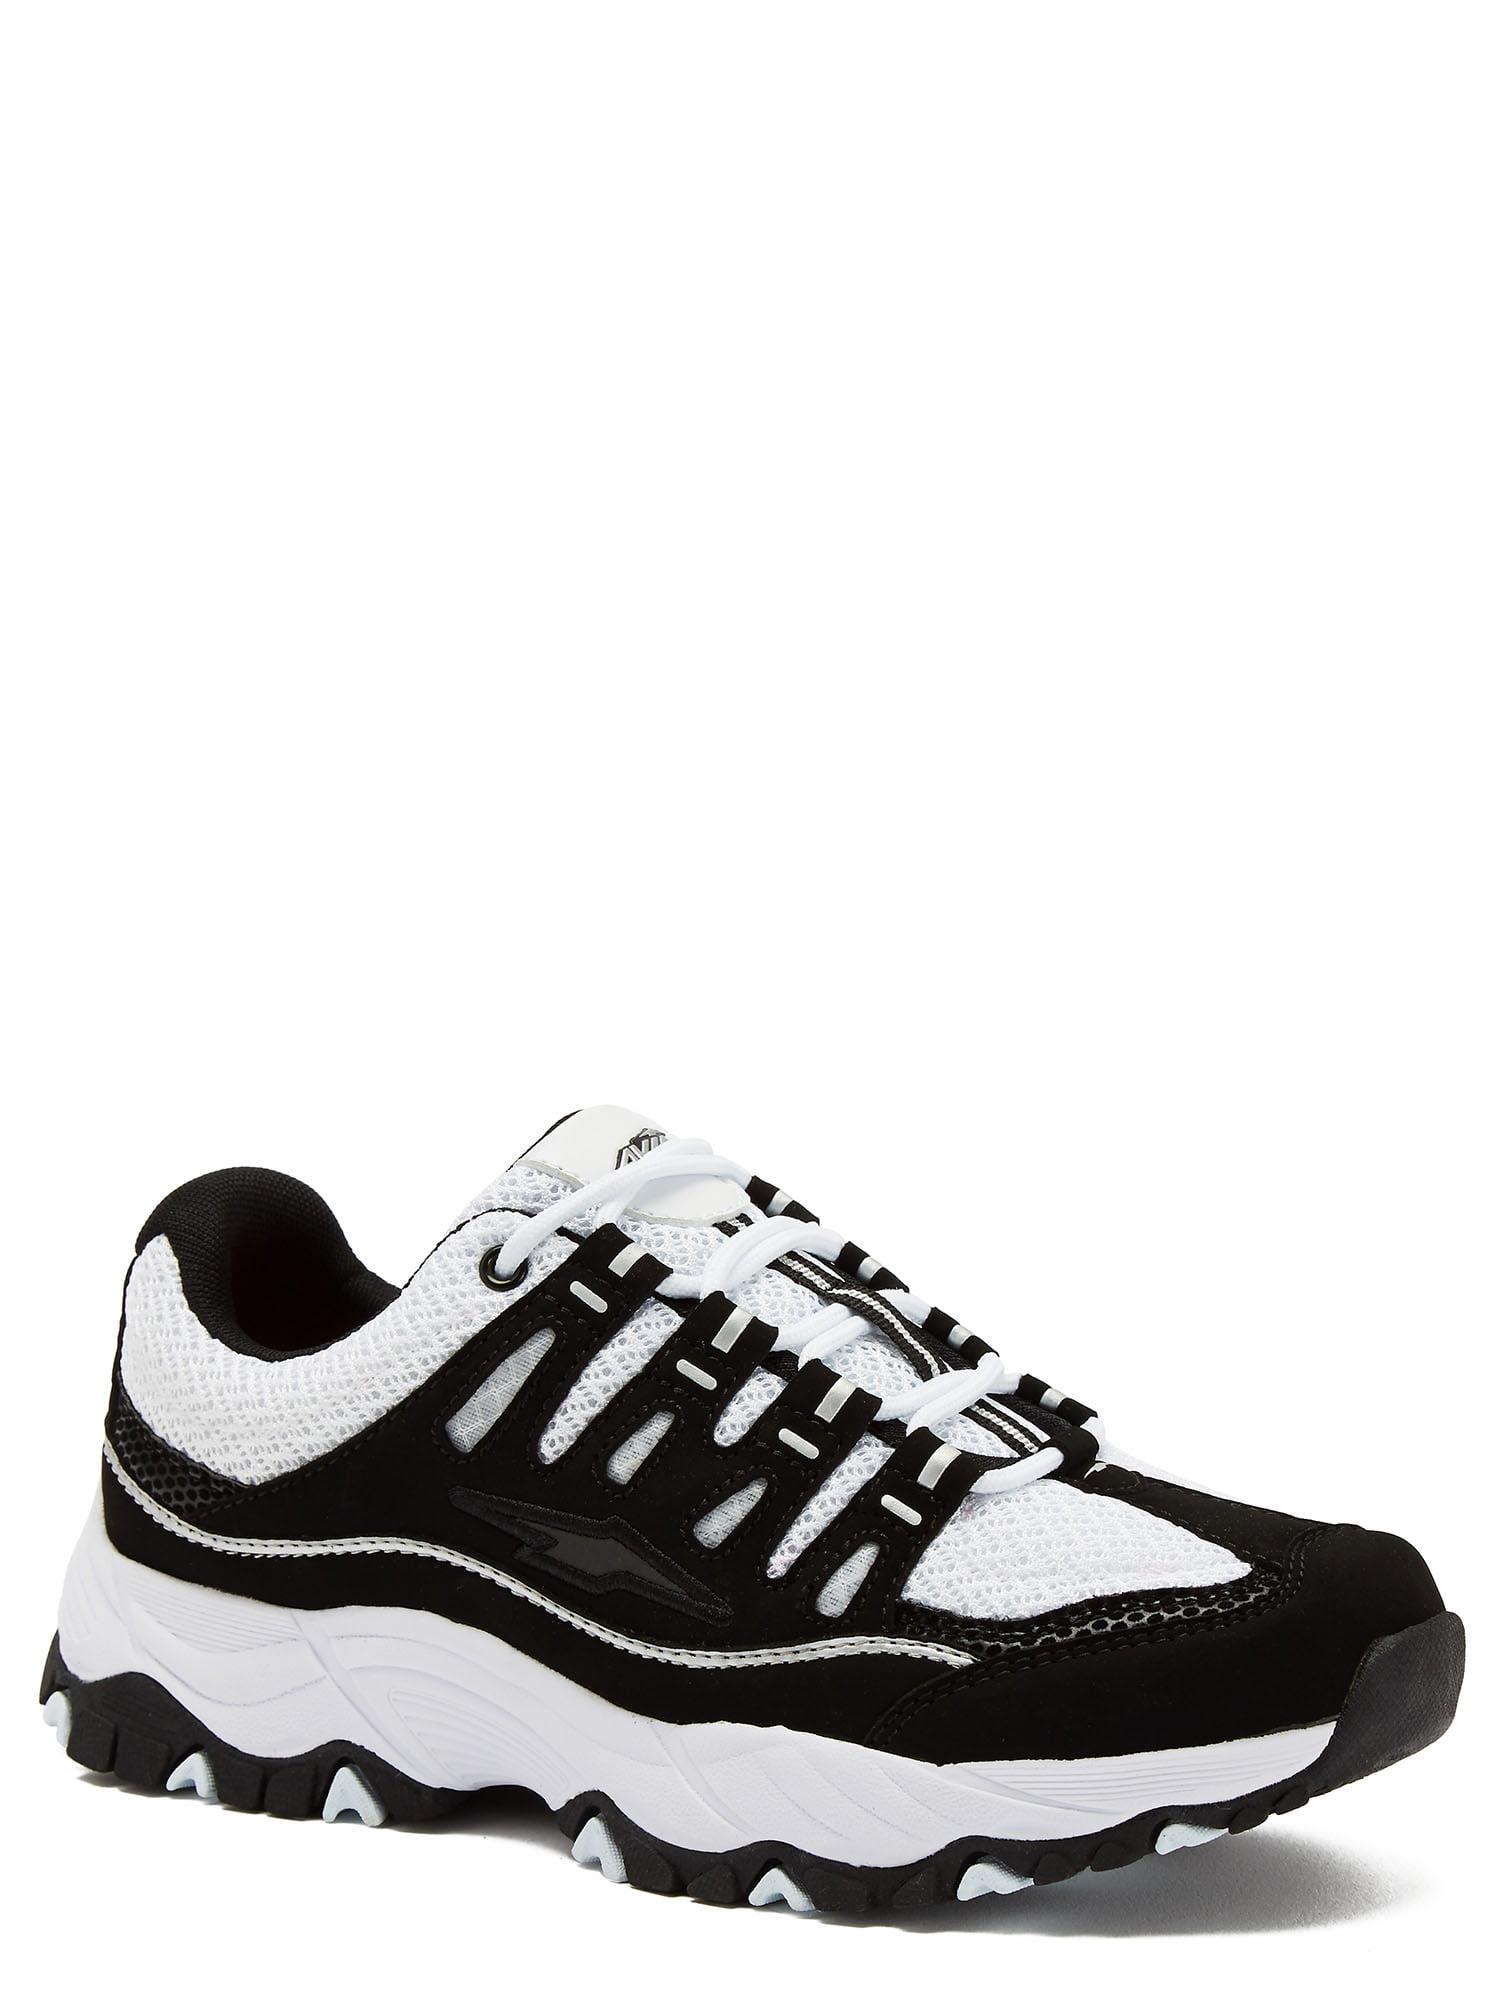 Avia Elevate Athletic Shoe Wide Width